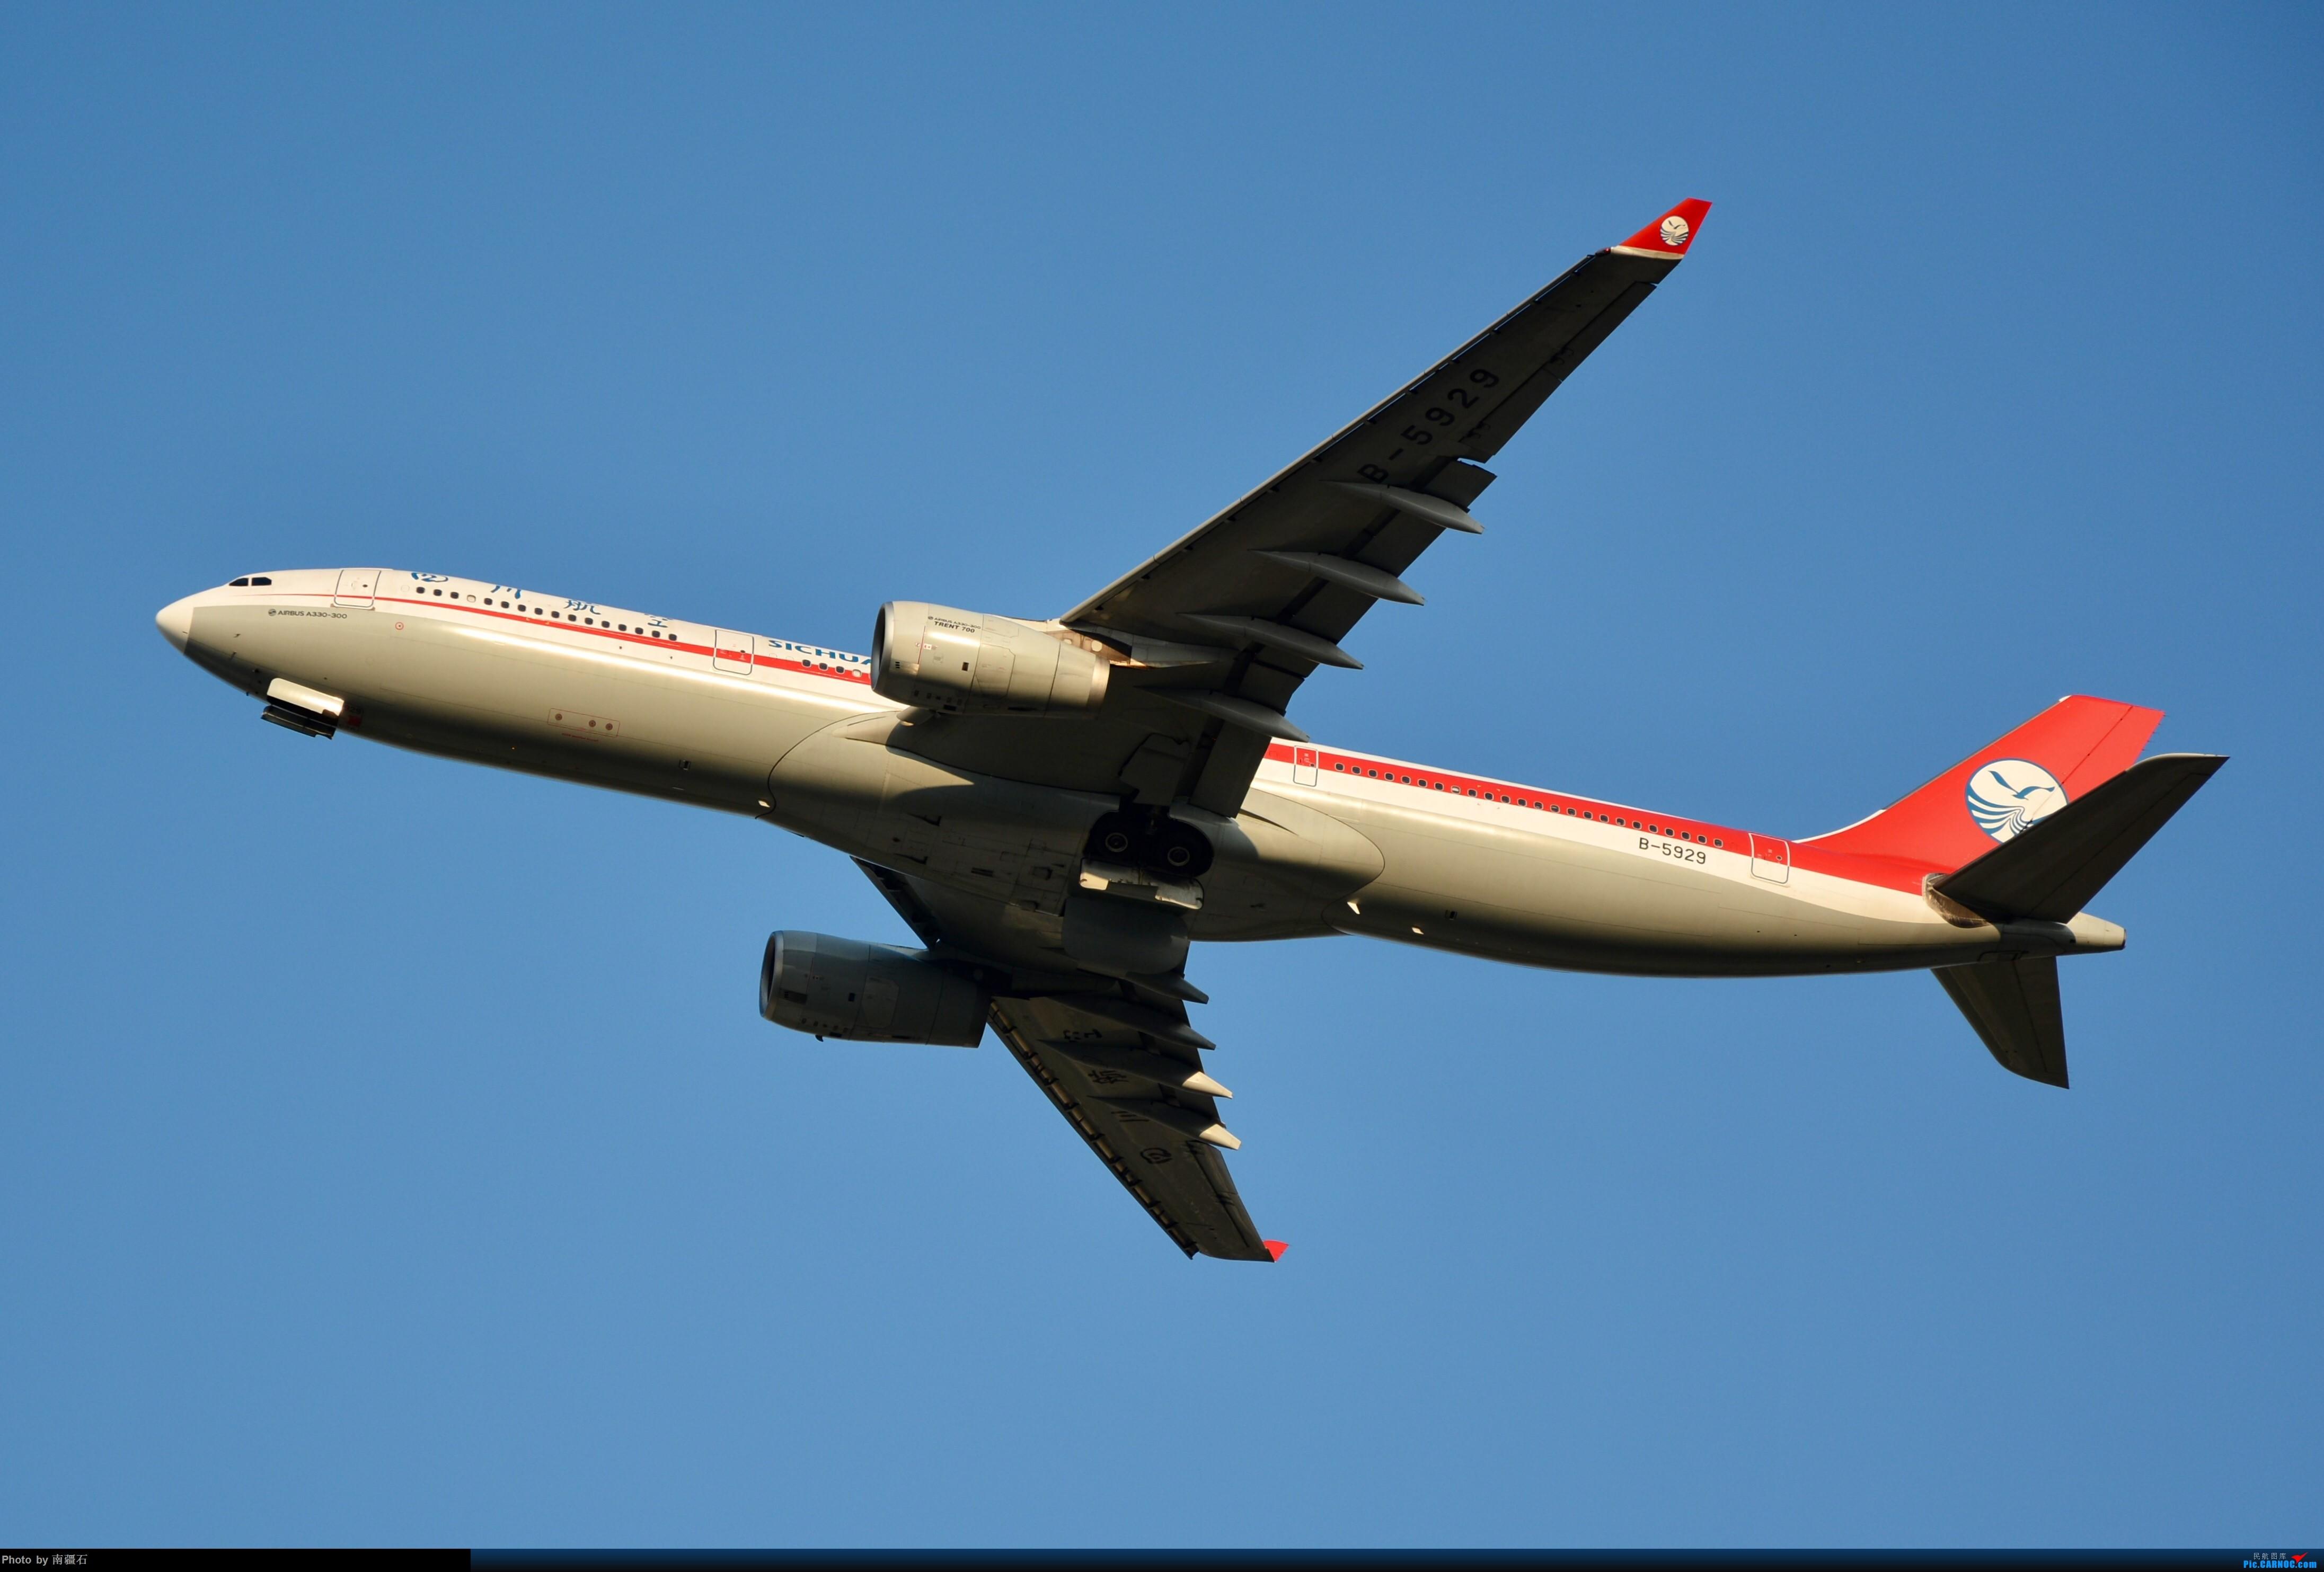 Re:[原创]CTU 川农的主场当然不能没有漂亮的川妹子 AIRBUS A330-300 B-5929 中国成都双流国际机场